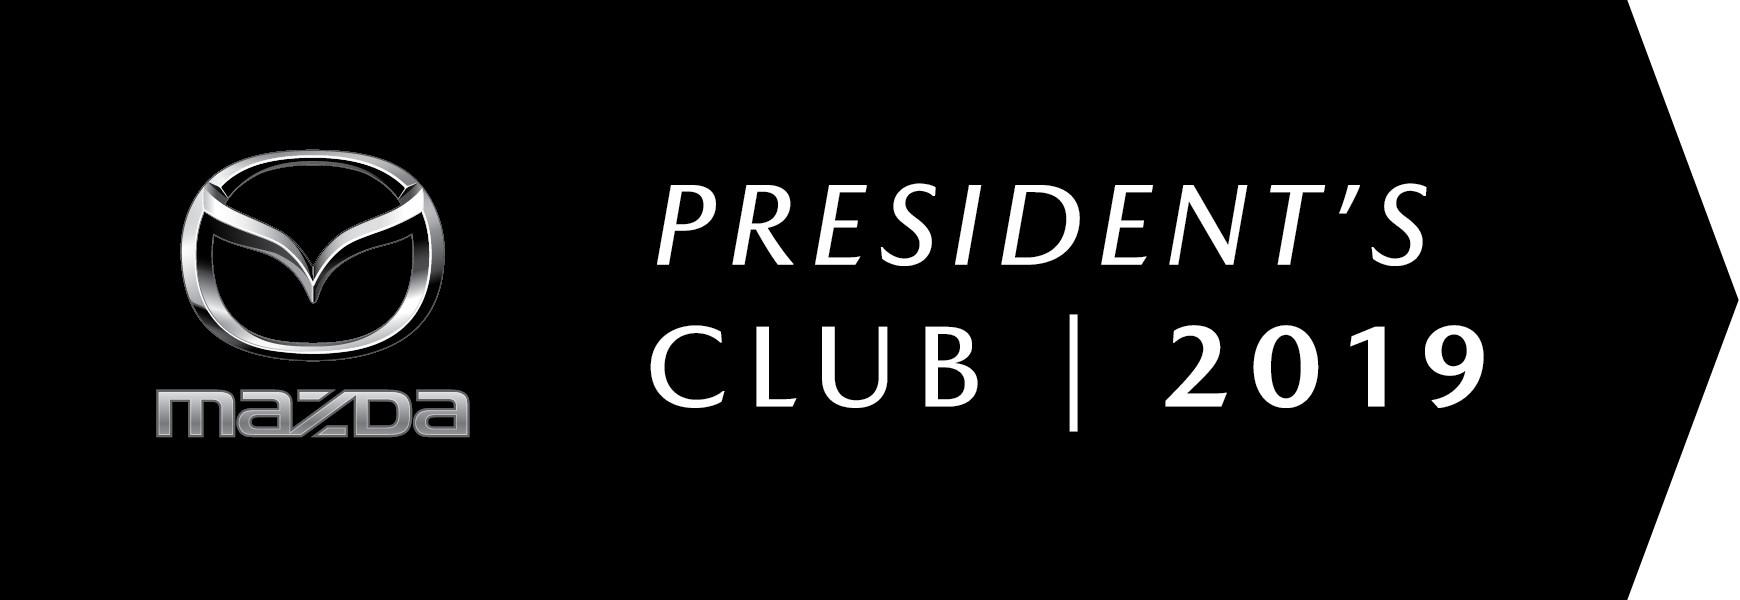 Culver City Mazda wins Presidents Club Award